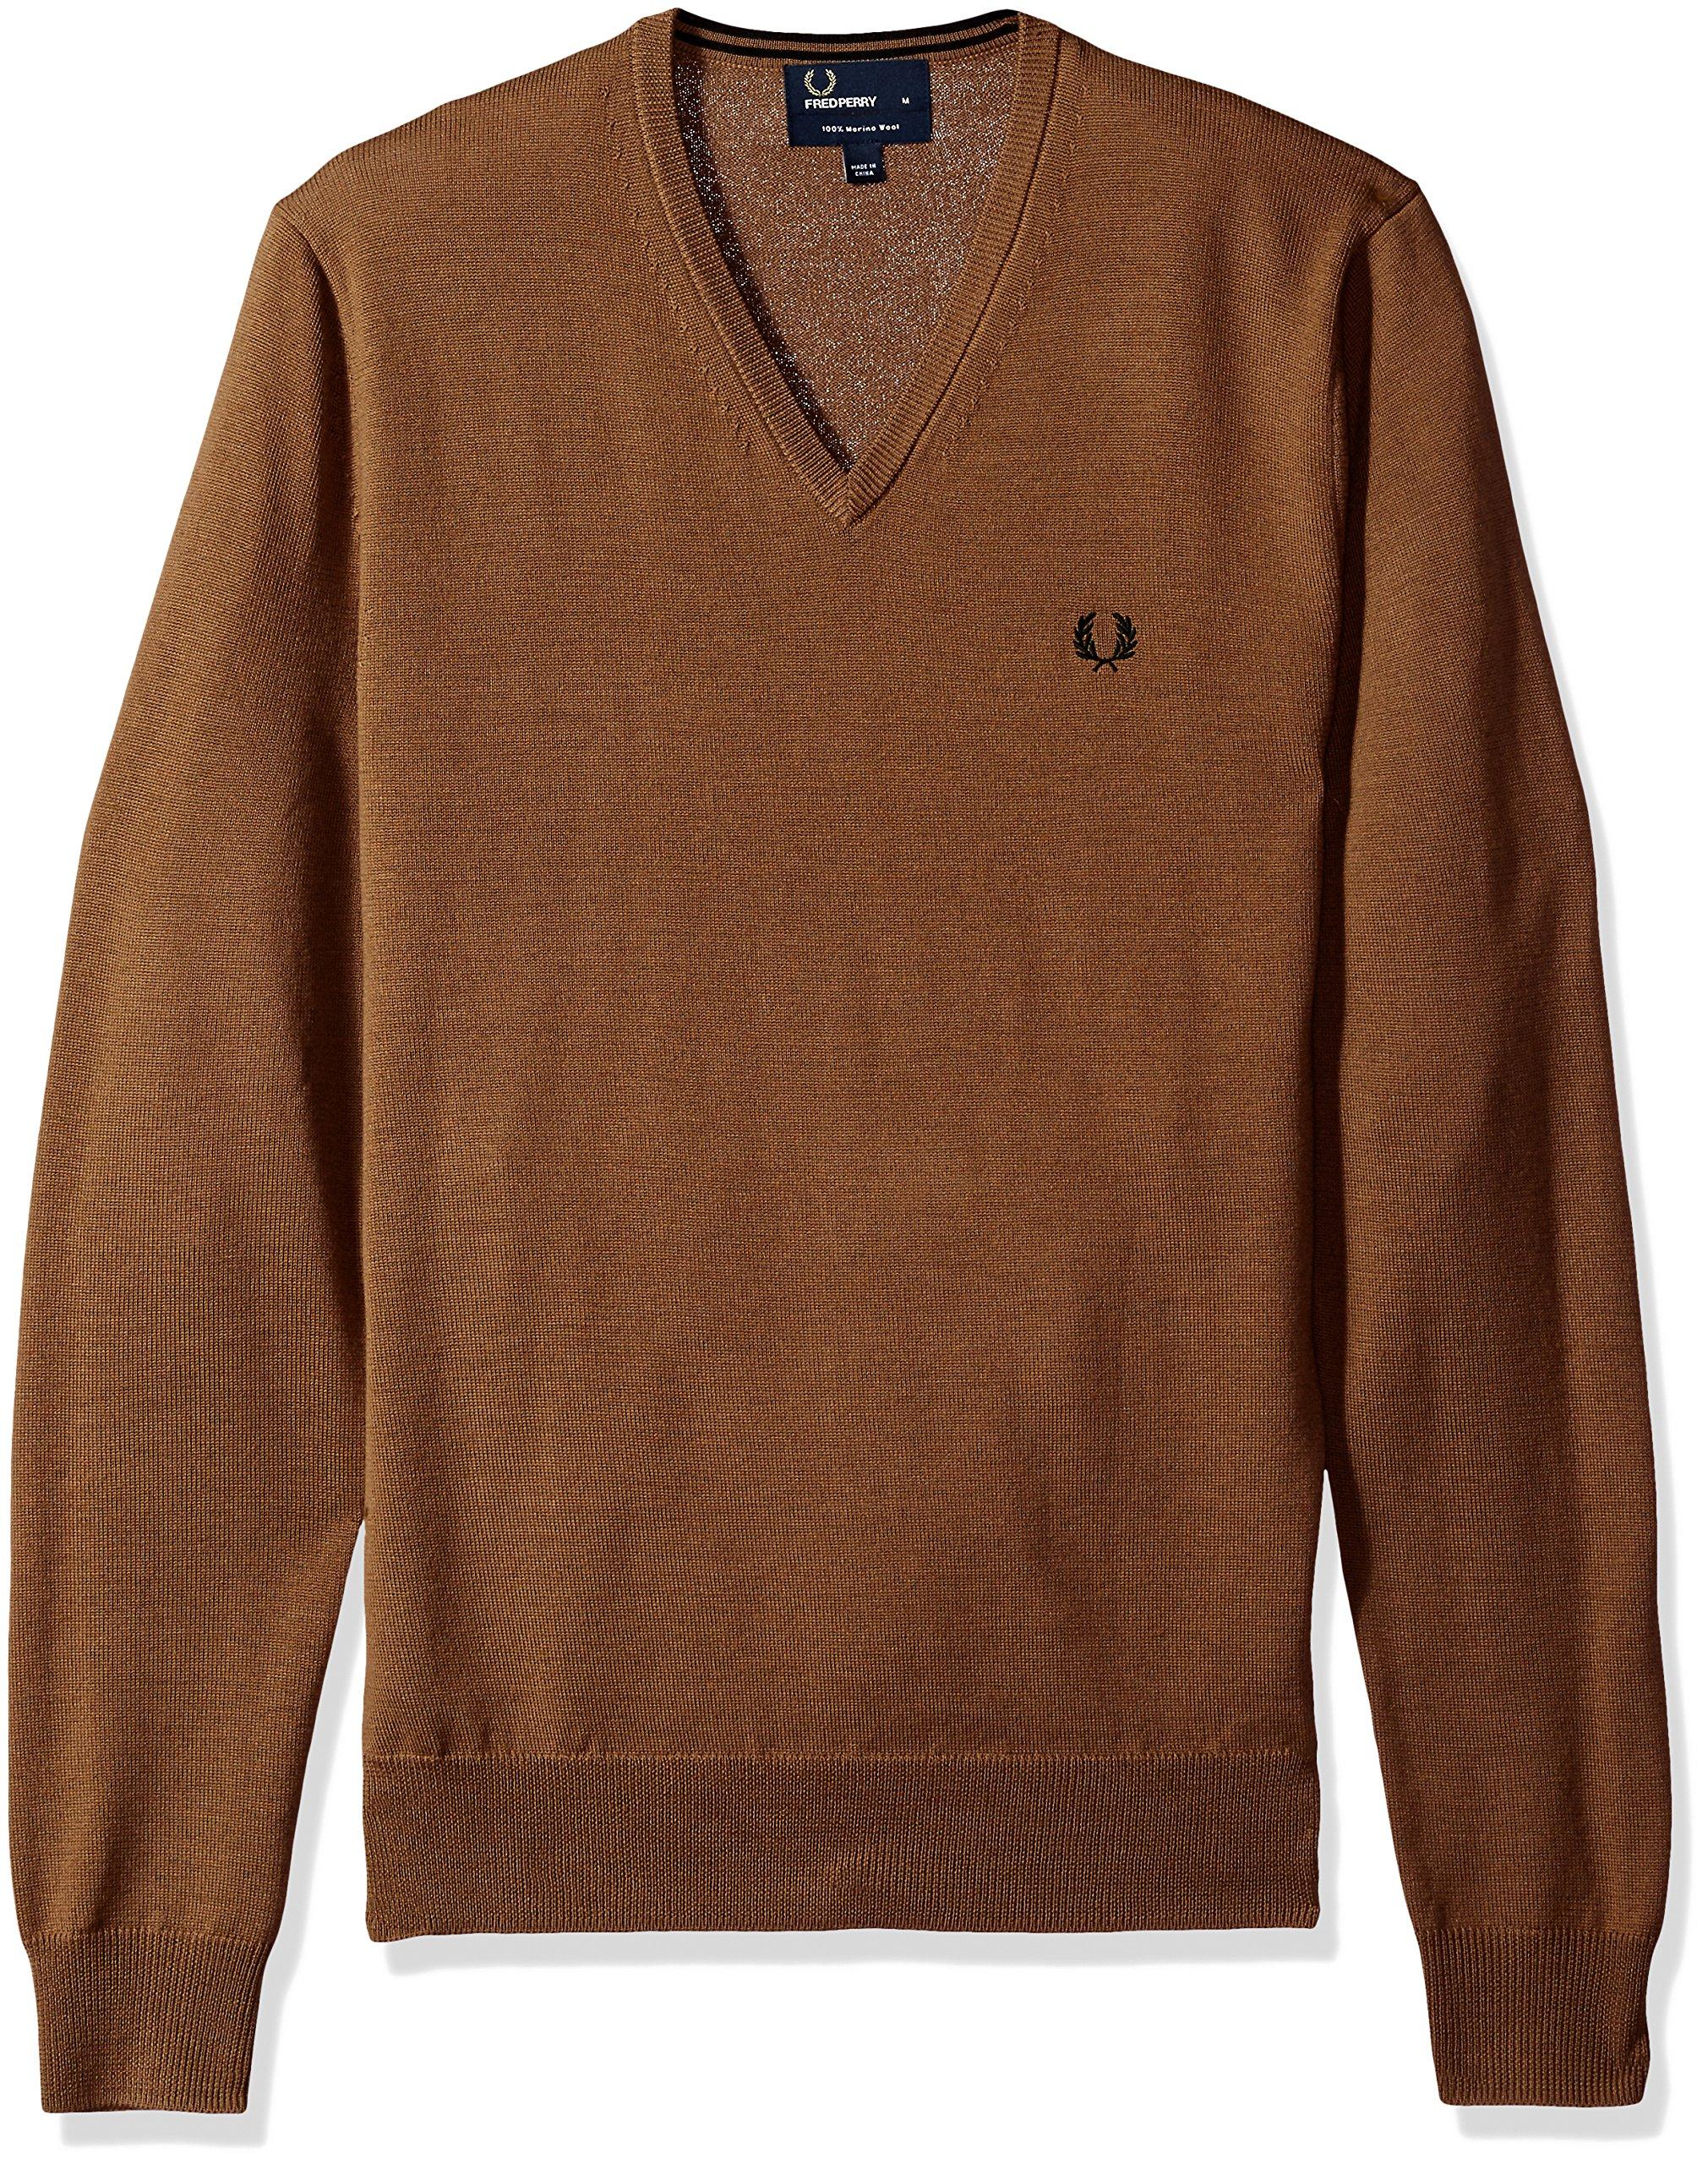 Fred Perry Men's Classic V-Neck Sweater,Dark Caramel,Medium